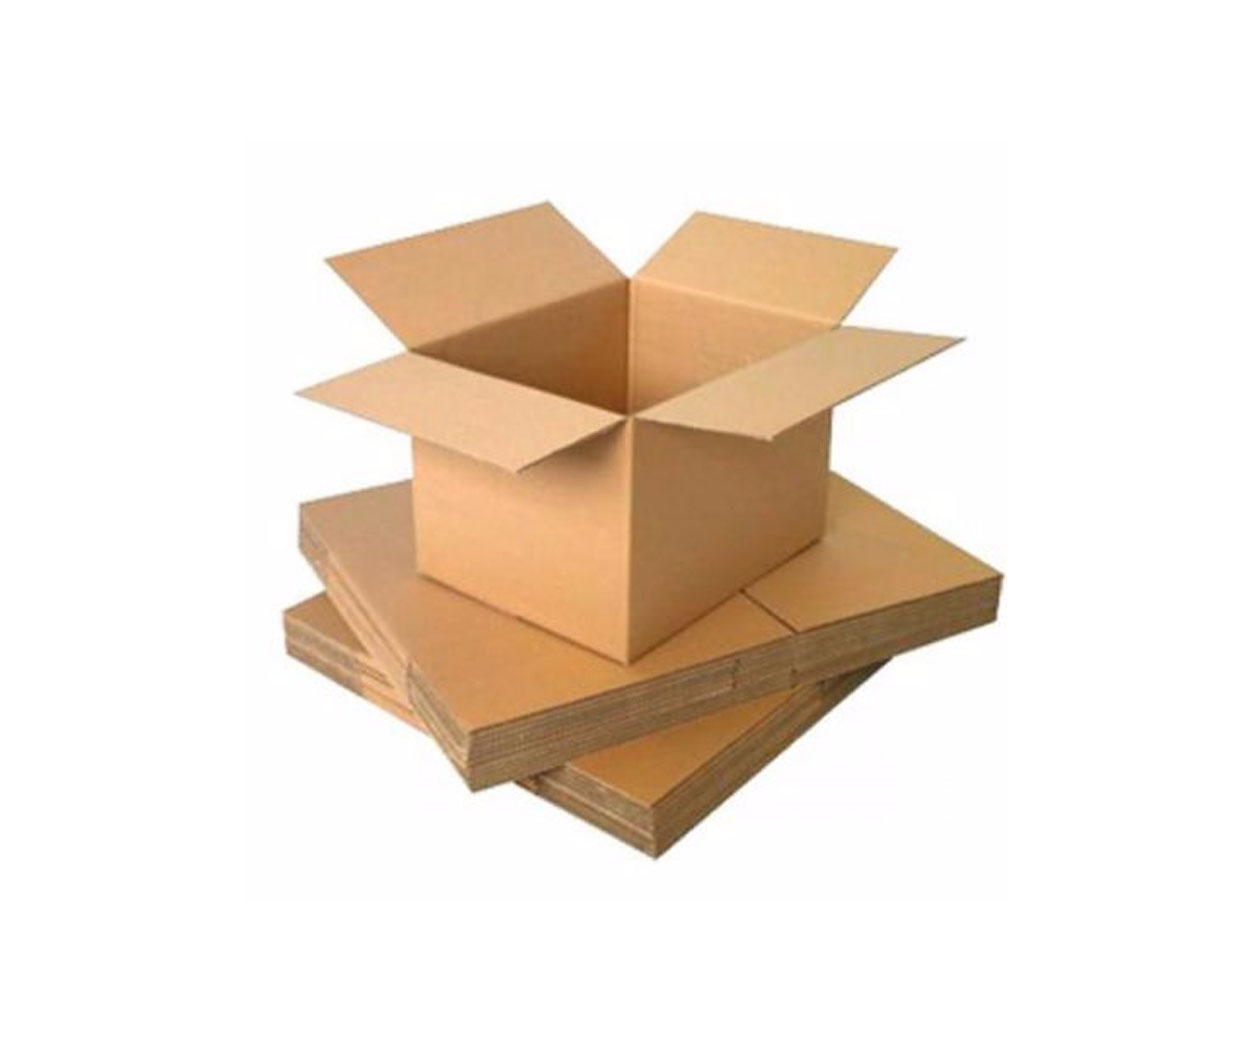 LYRECO SINGLE WALL CARD BOARD BOX 381x254x254MM